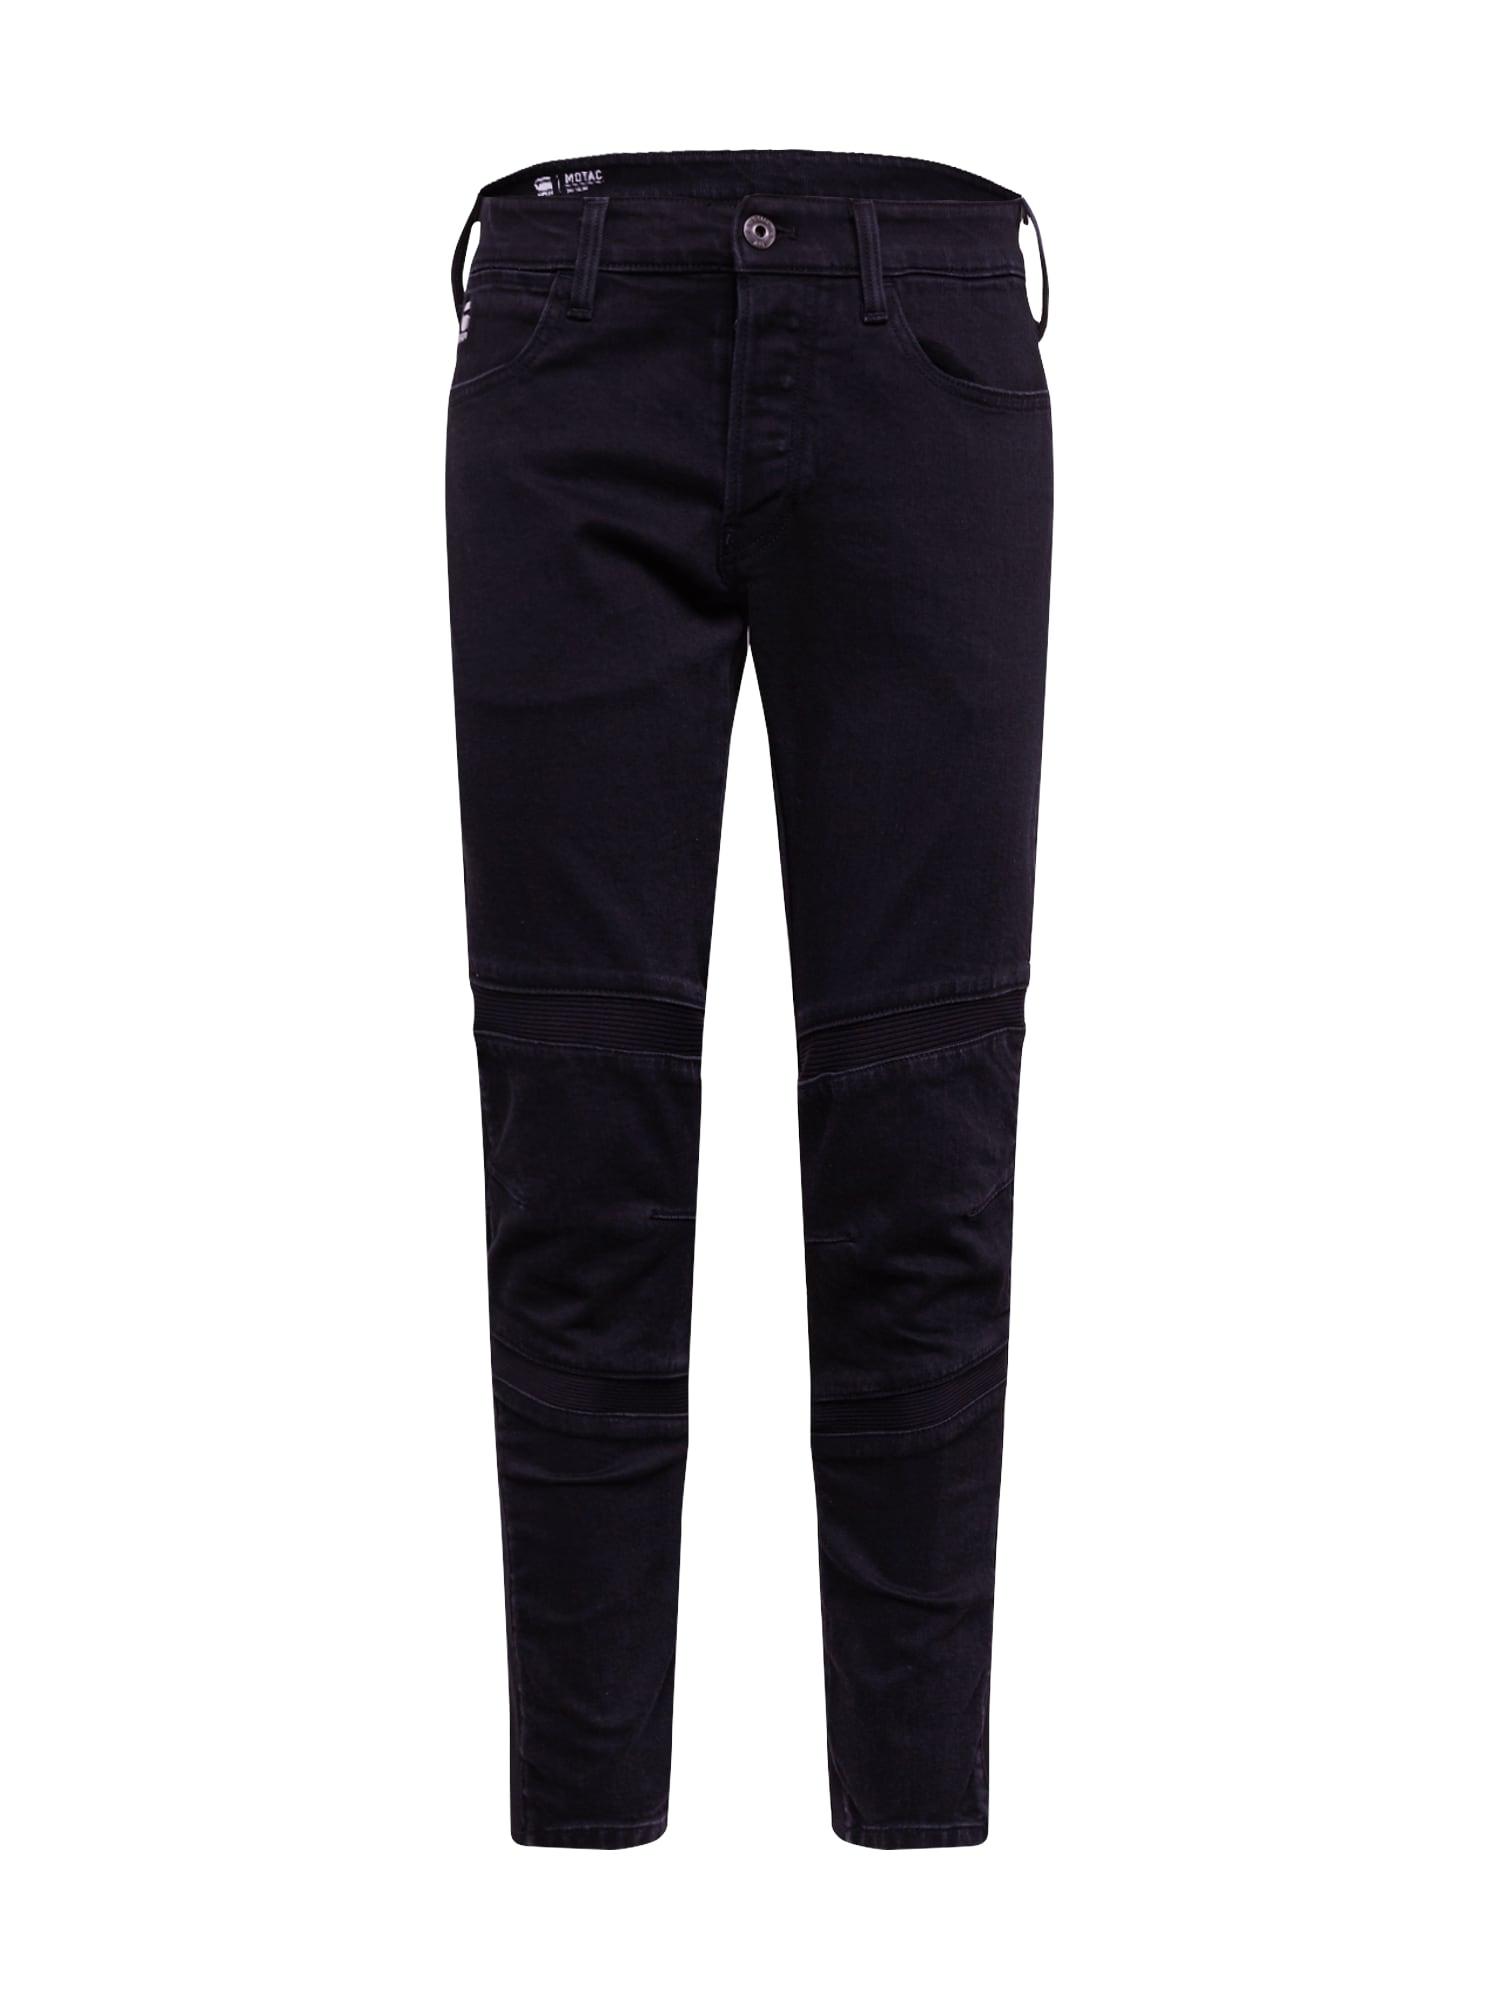 G-Star RAW Džinsai 'Motac 3D Slim' juodo džinso spalva